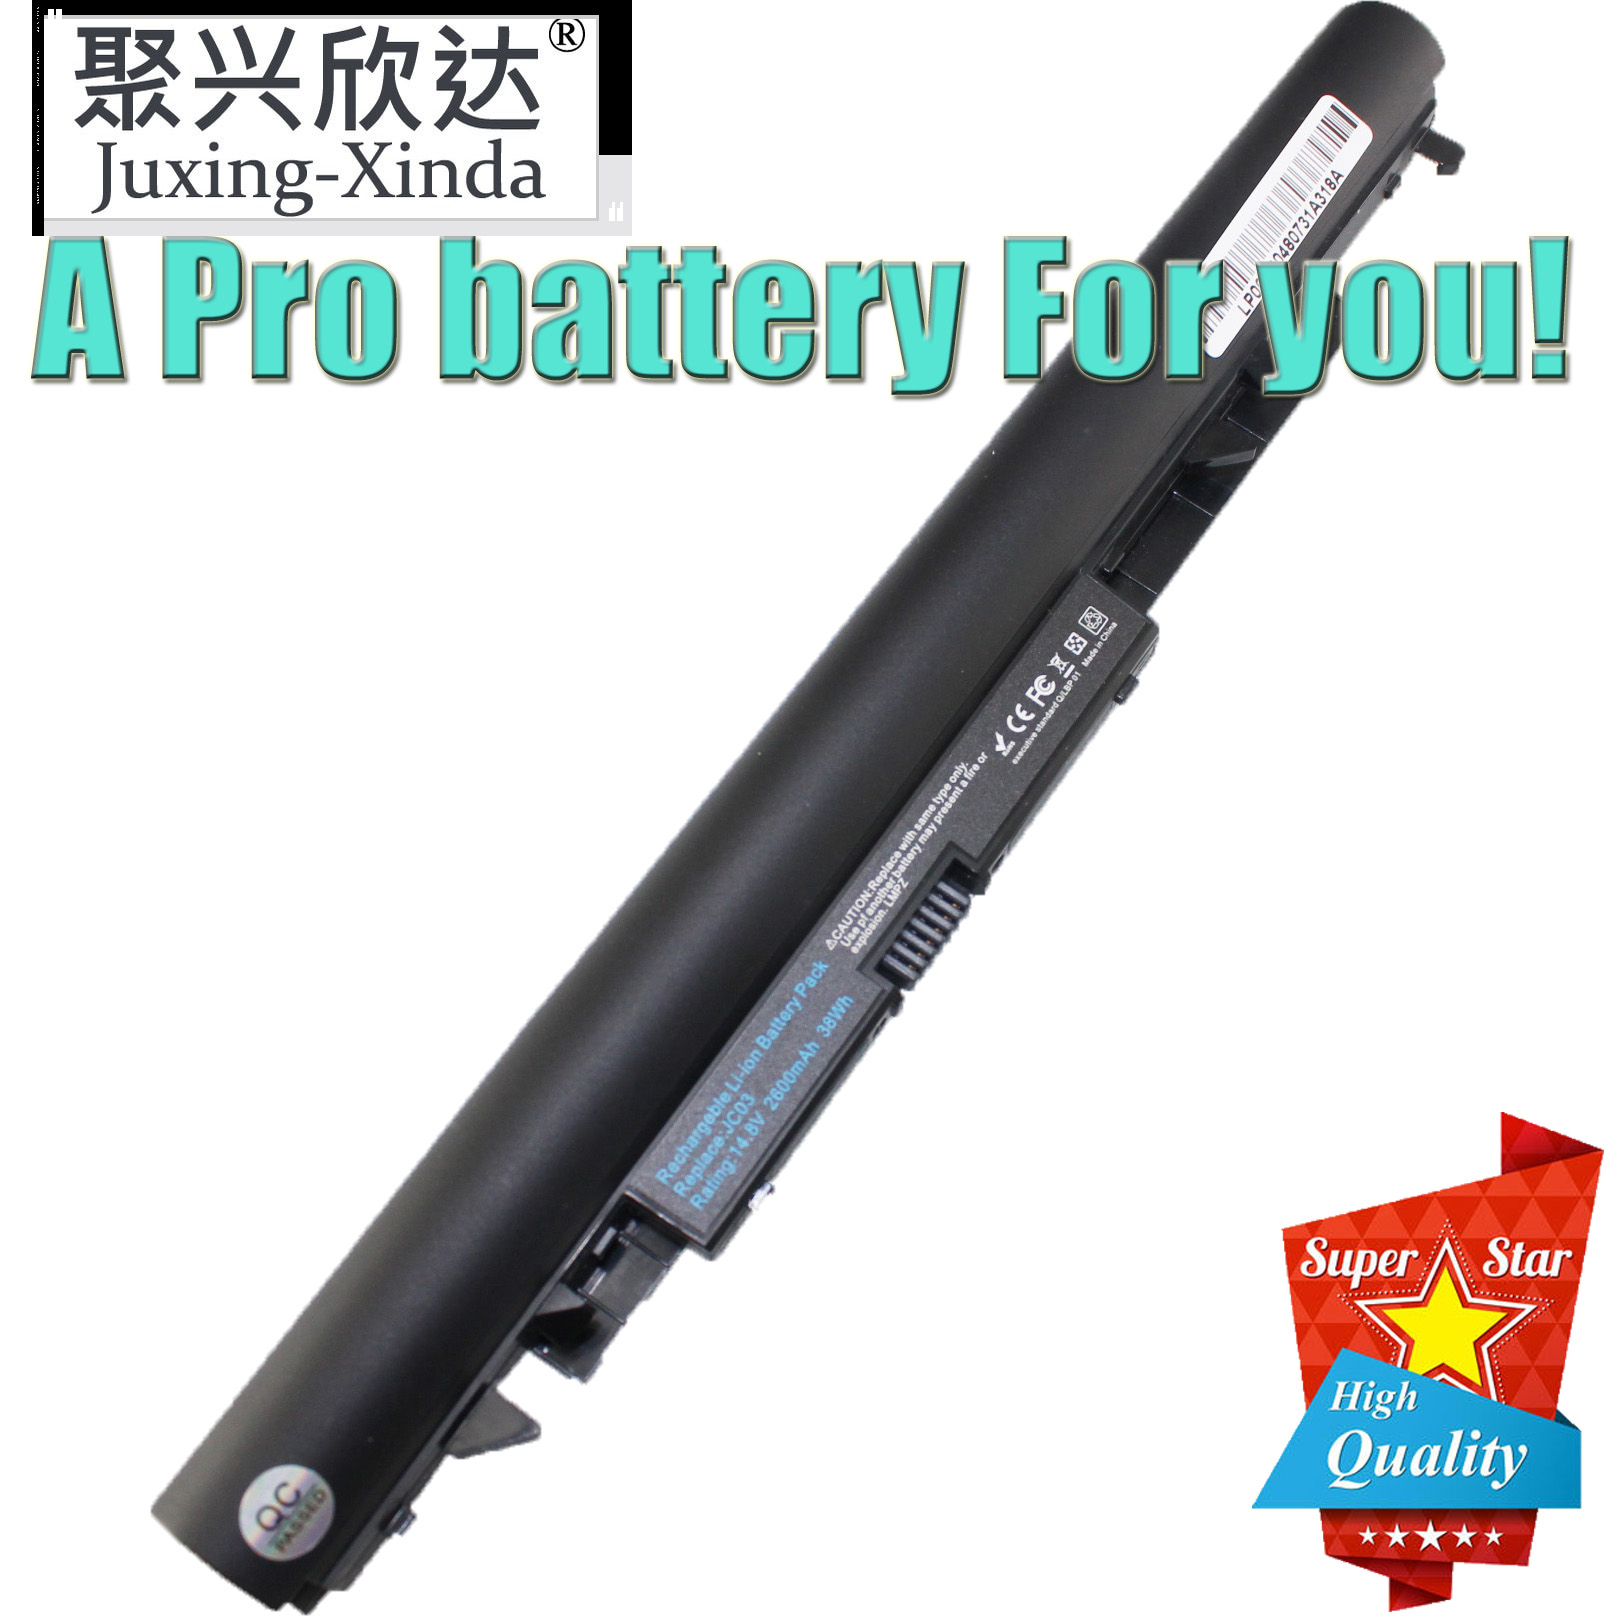 JC04 JC03 Notebook Battery Replacement for HP 15-bs 15-bw 17-bs Series Laptop fits HP HSTNN-HB7X HSTNN-LB7V HSTNN-LB7W Spare 919682-121 919700-850 919701-850 TPN-C129 C130 Q186 W129 W130 Battery